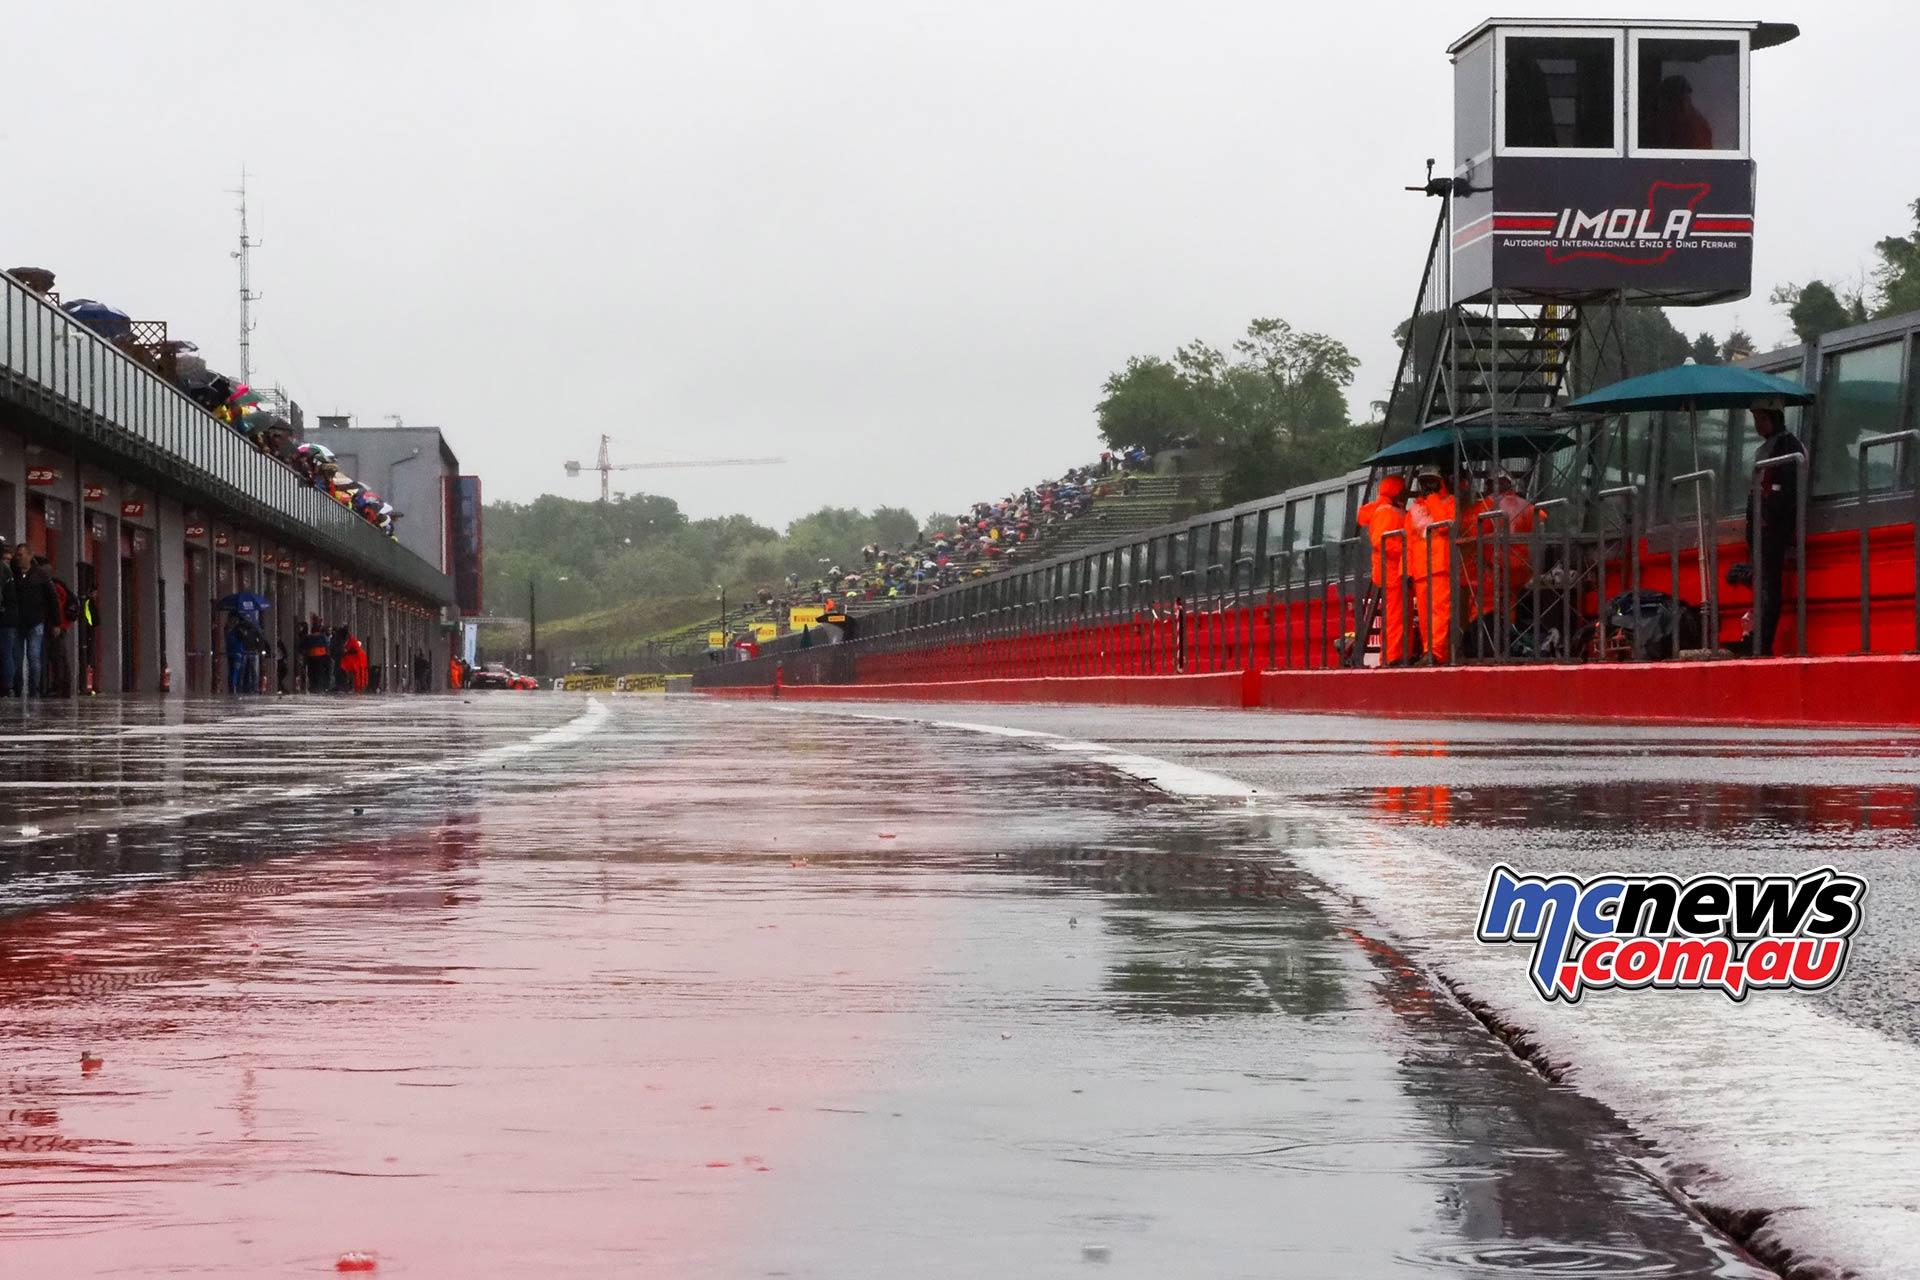 WSBK Rnd Imola Sunday Rain Track